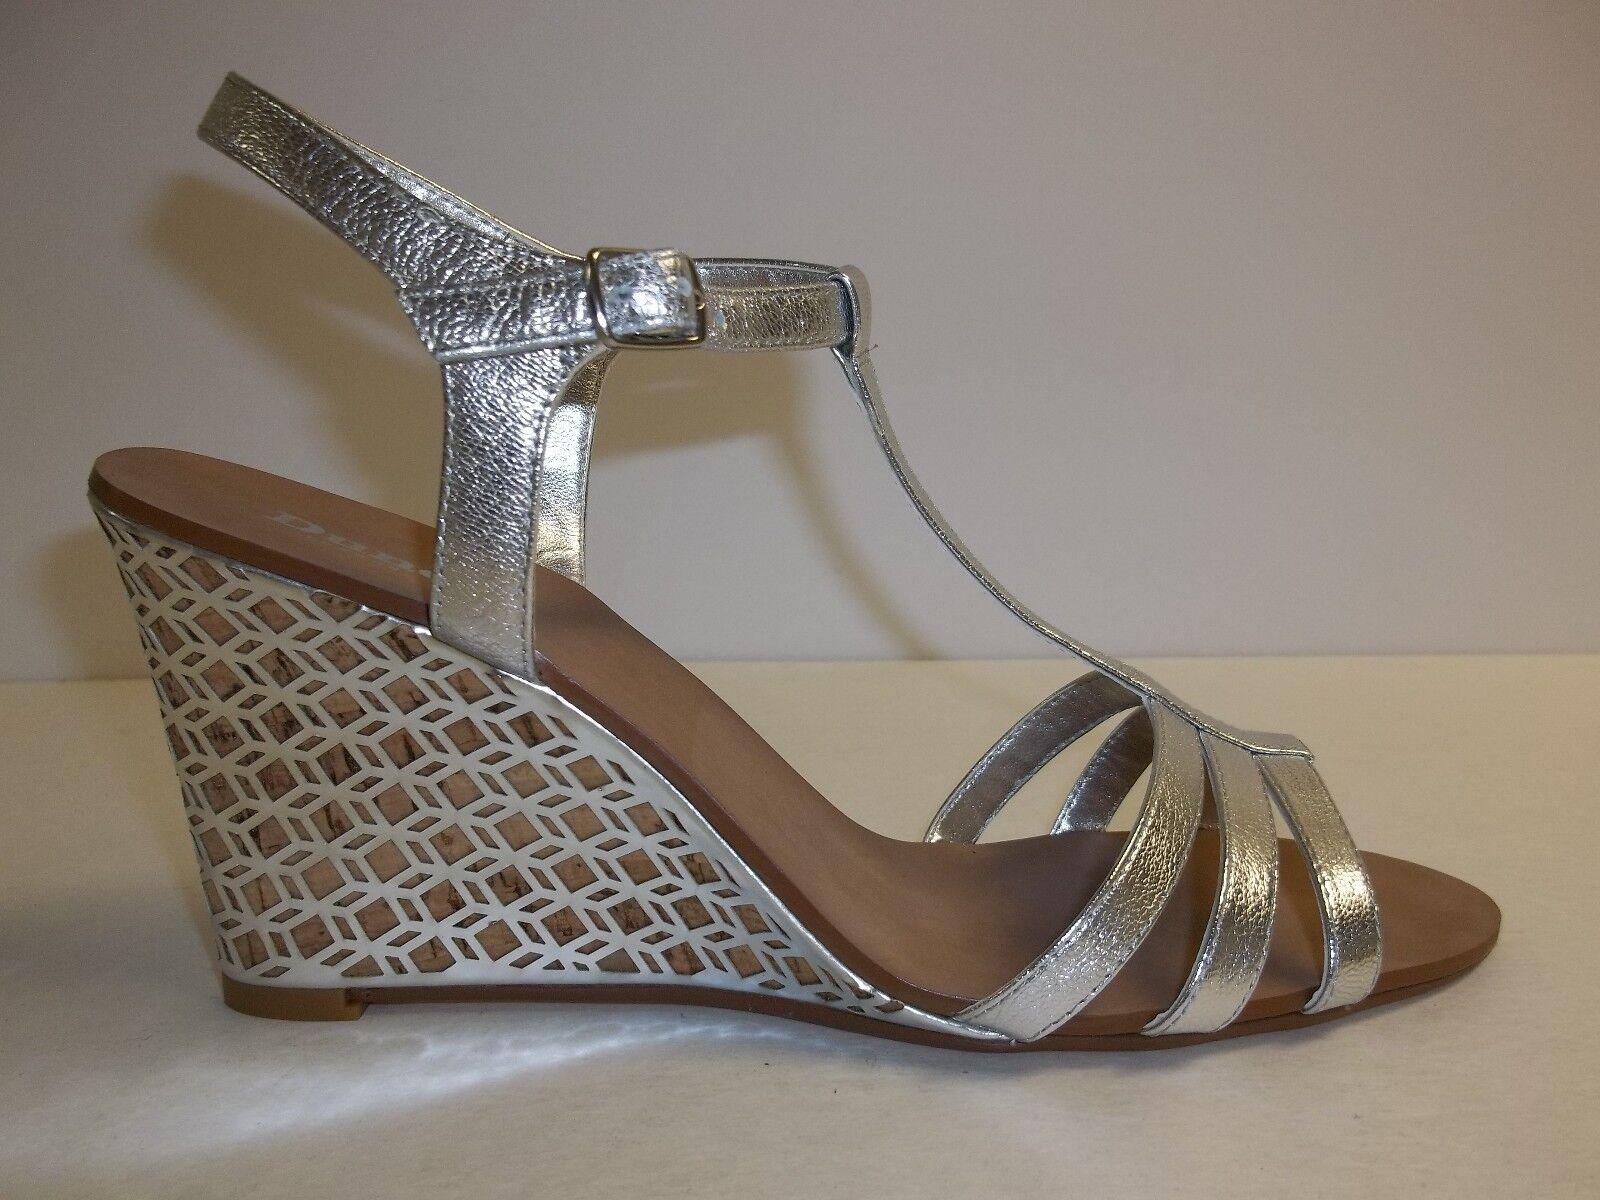 Dune London Größe 10 M Gately Silver Leder Laser Wedge Sandales NEU Damenschuhe Schuhes